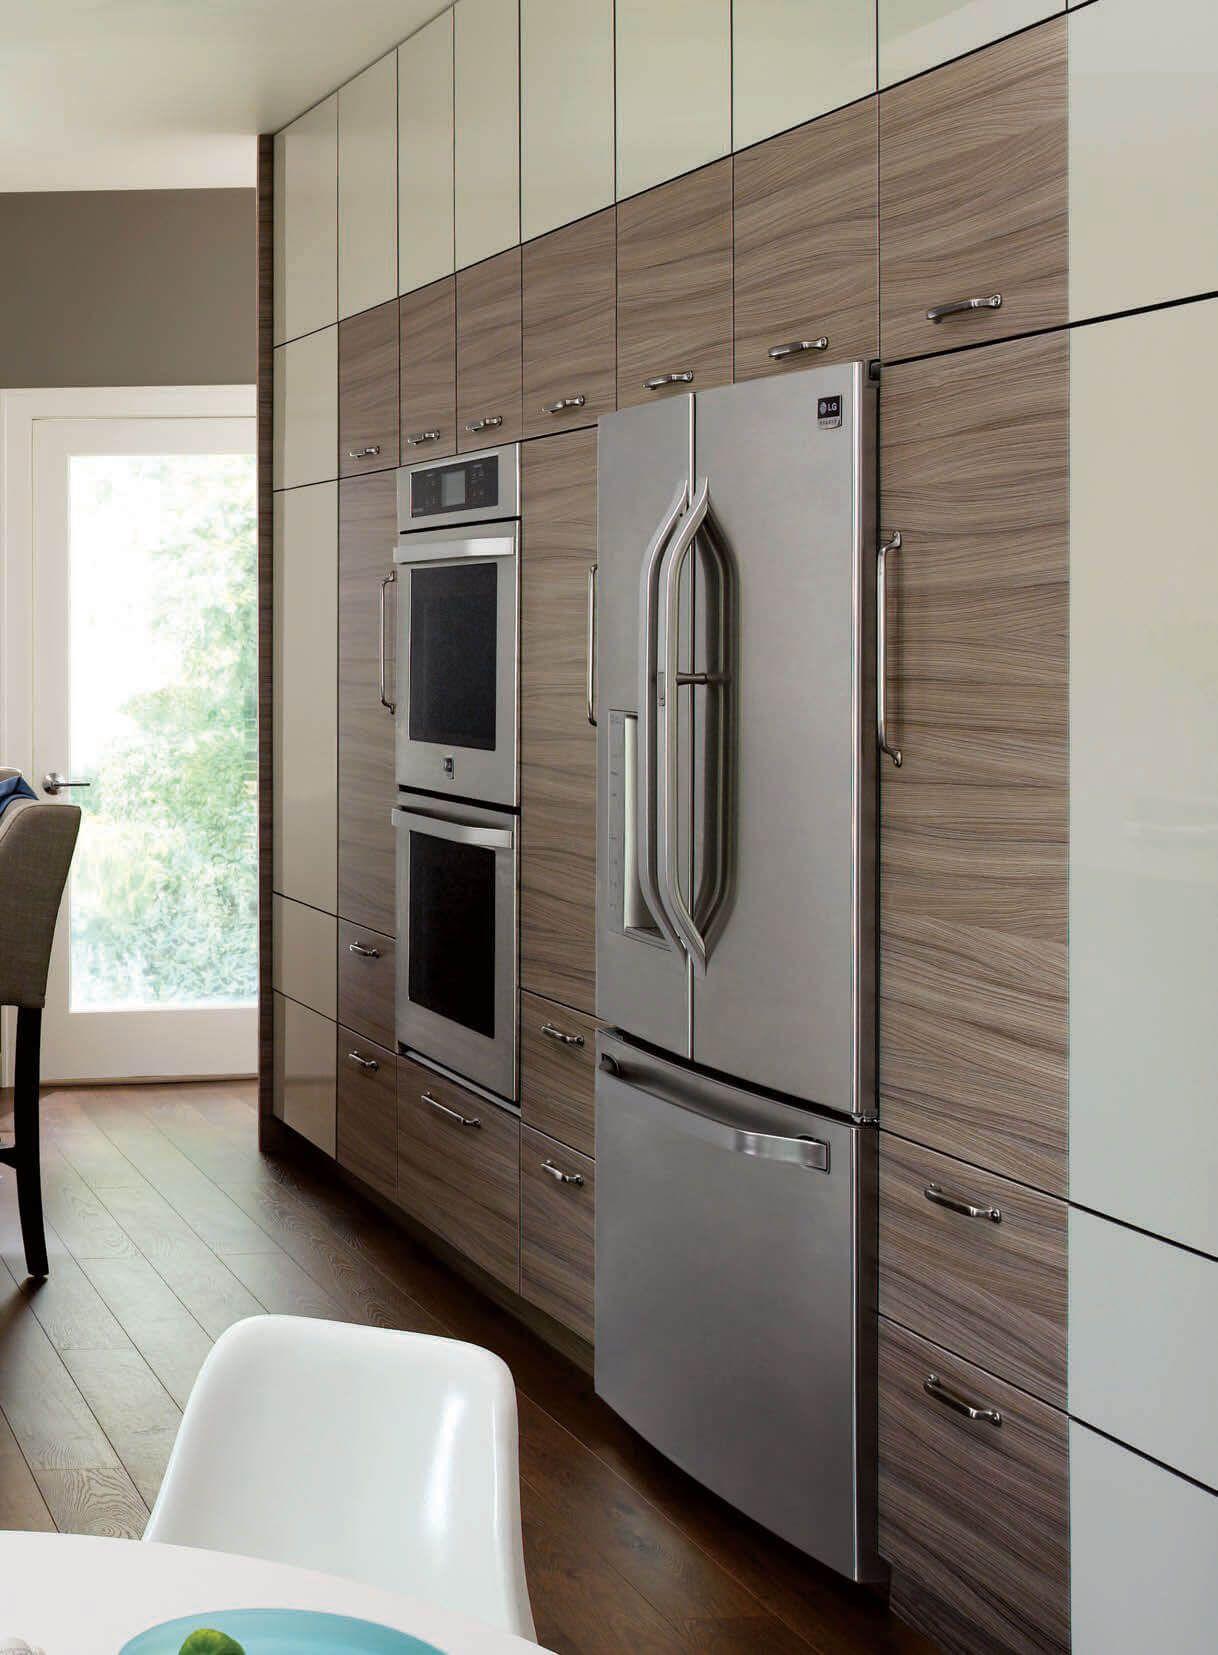 Studio41 Home Design Showroom Cabinetry Americraft Semi Custom Cabinetry In 2020 Custom Cabinetry Cabinetry Kitchen Hardware